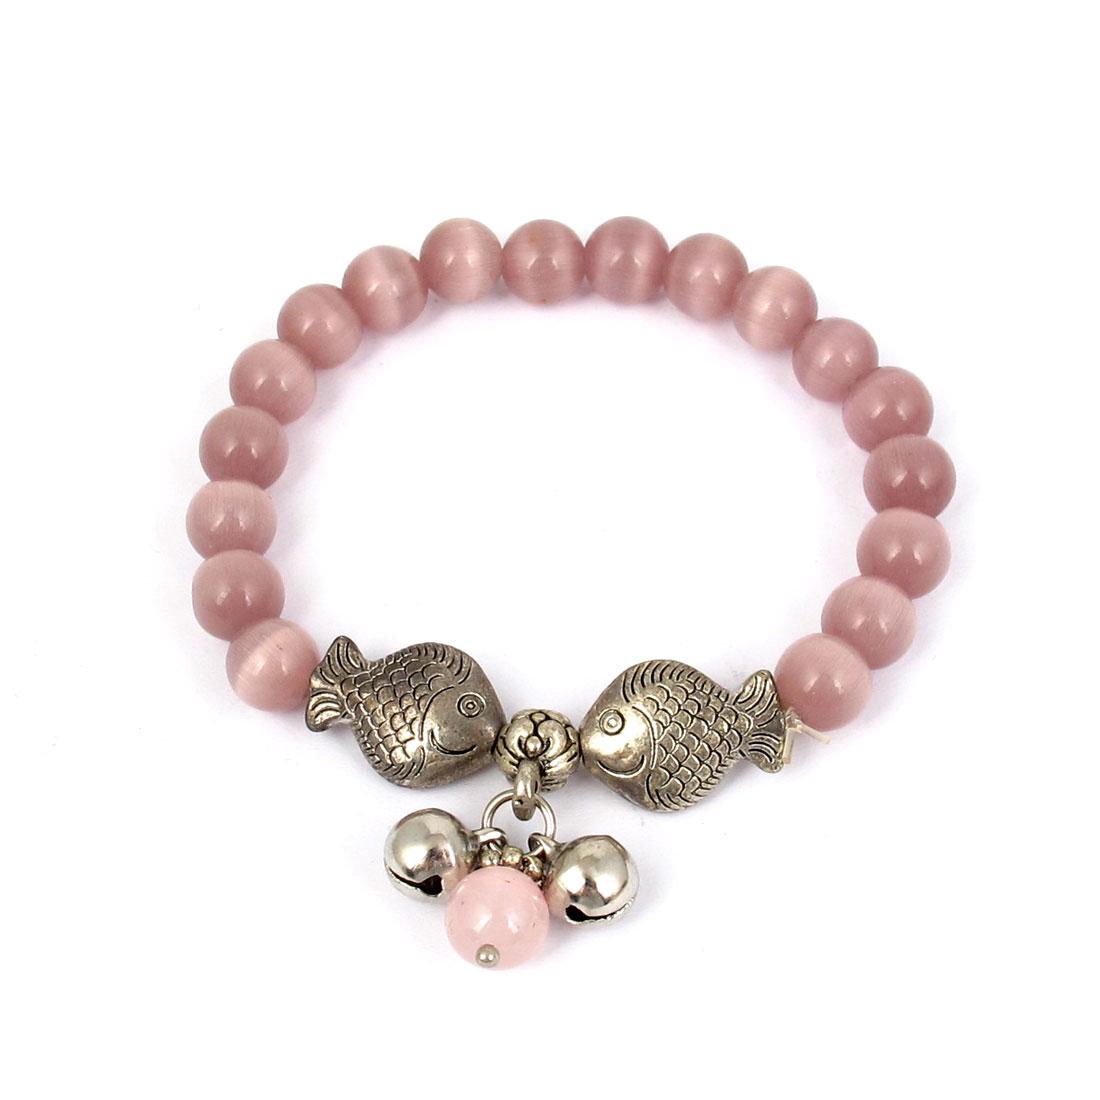 Fish Detail Round Opal Bead Wrist Ornament Bangle Bracelet Light Purple Silver Tone for Women